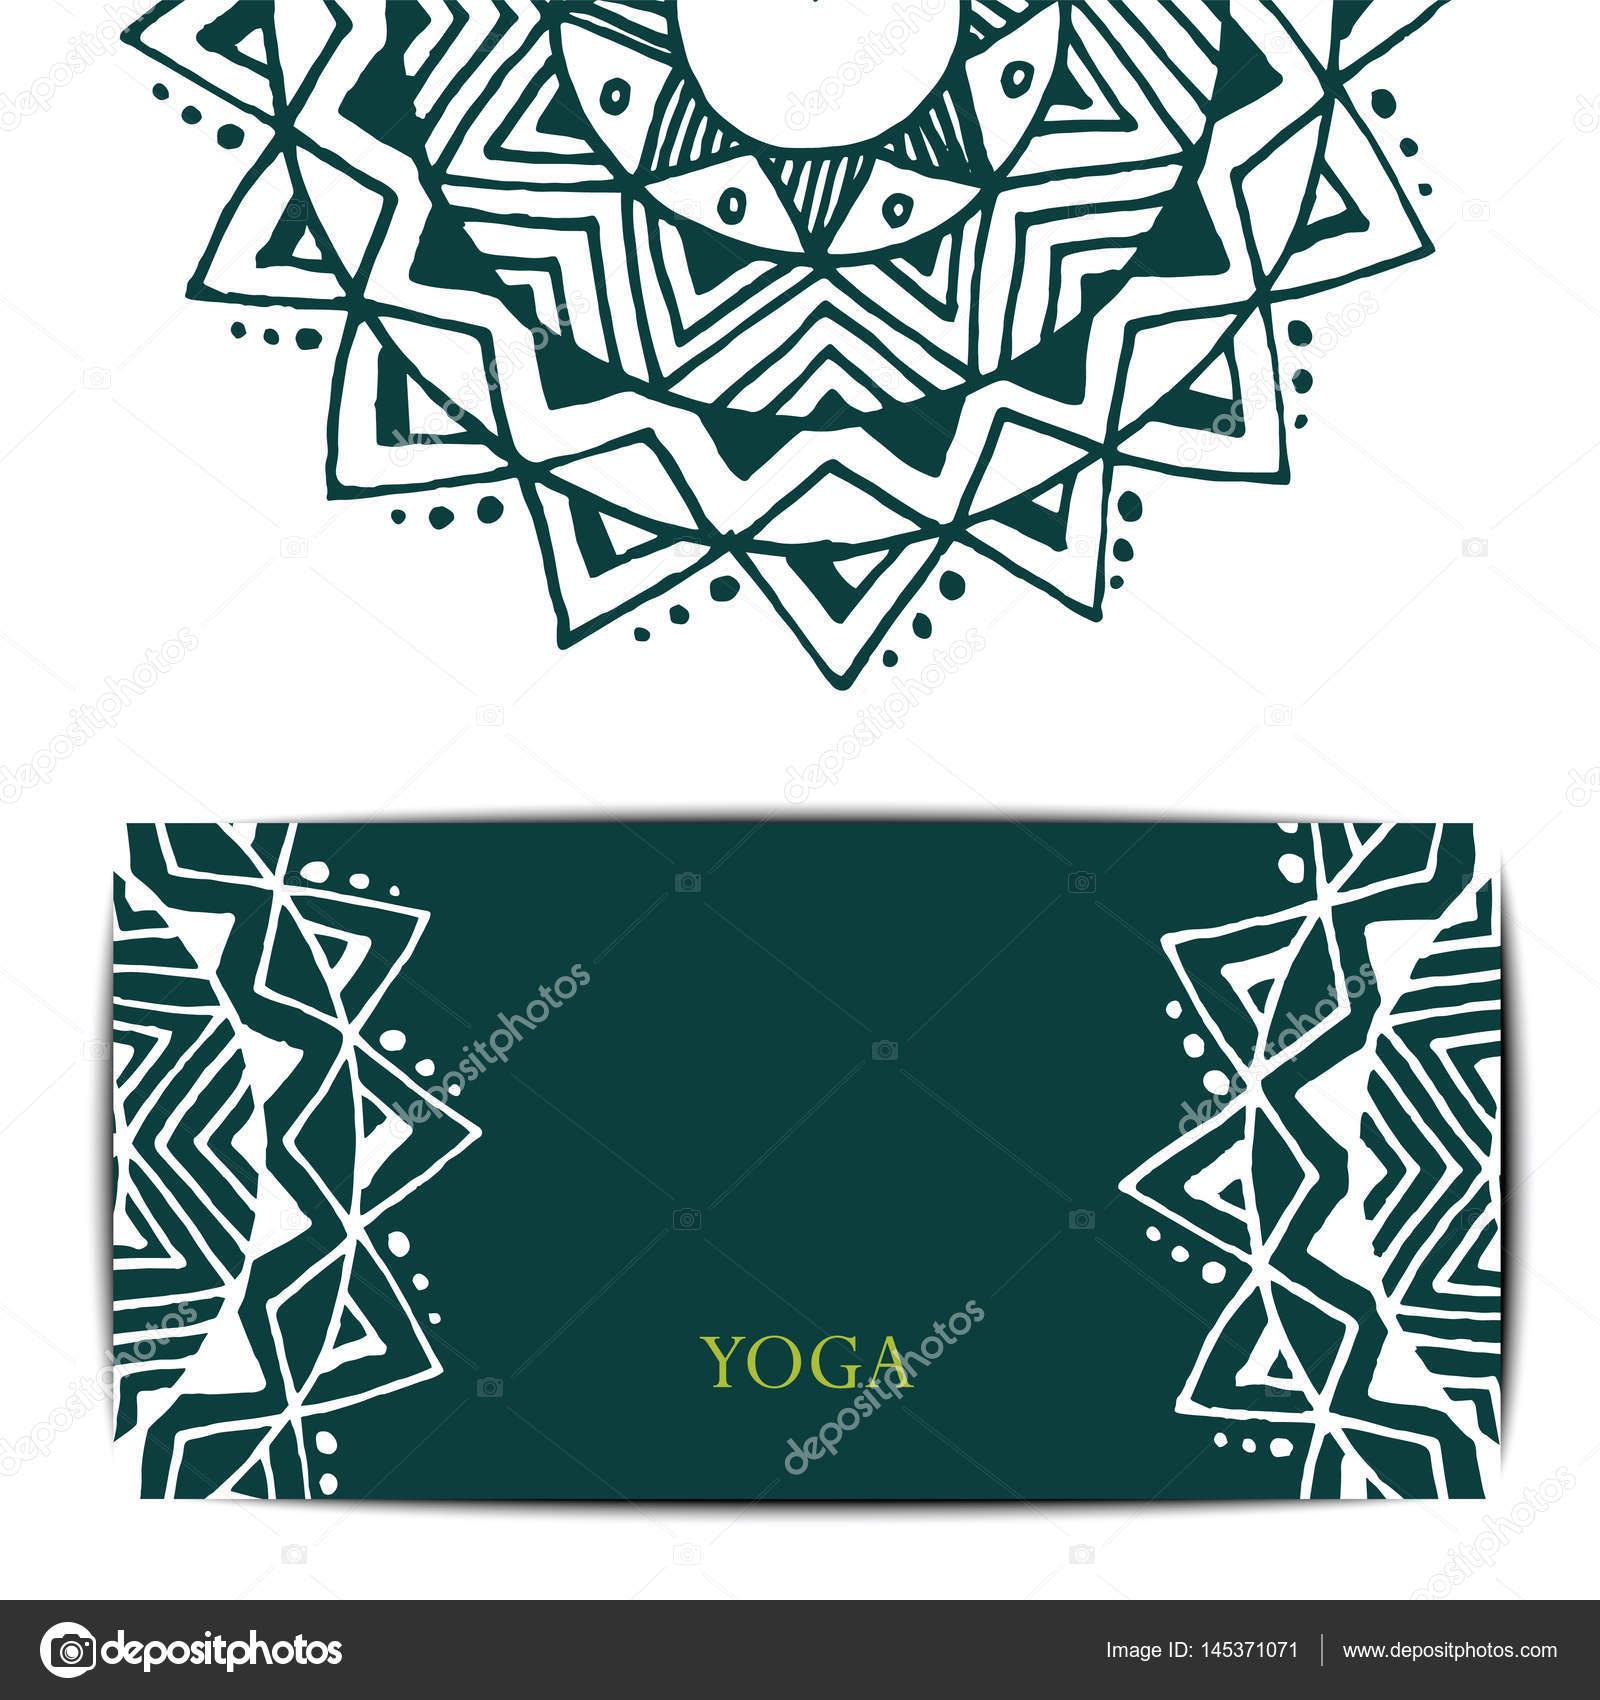 Plantilla de tarjeta de regalo de estudio de yoga — Vector de stock ...